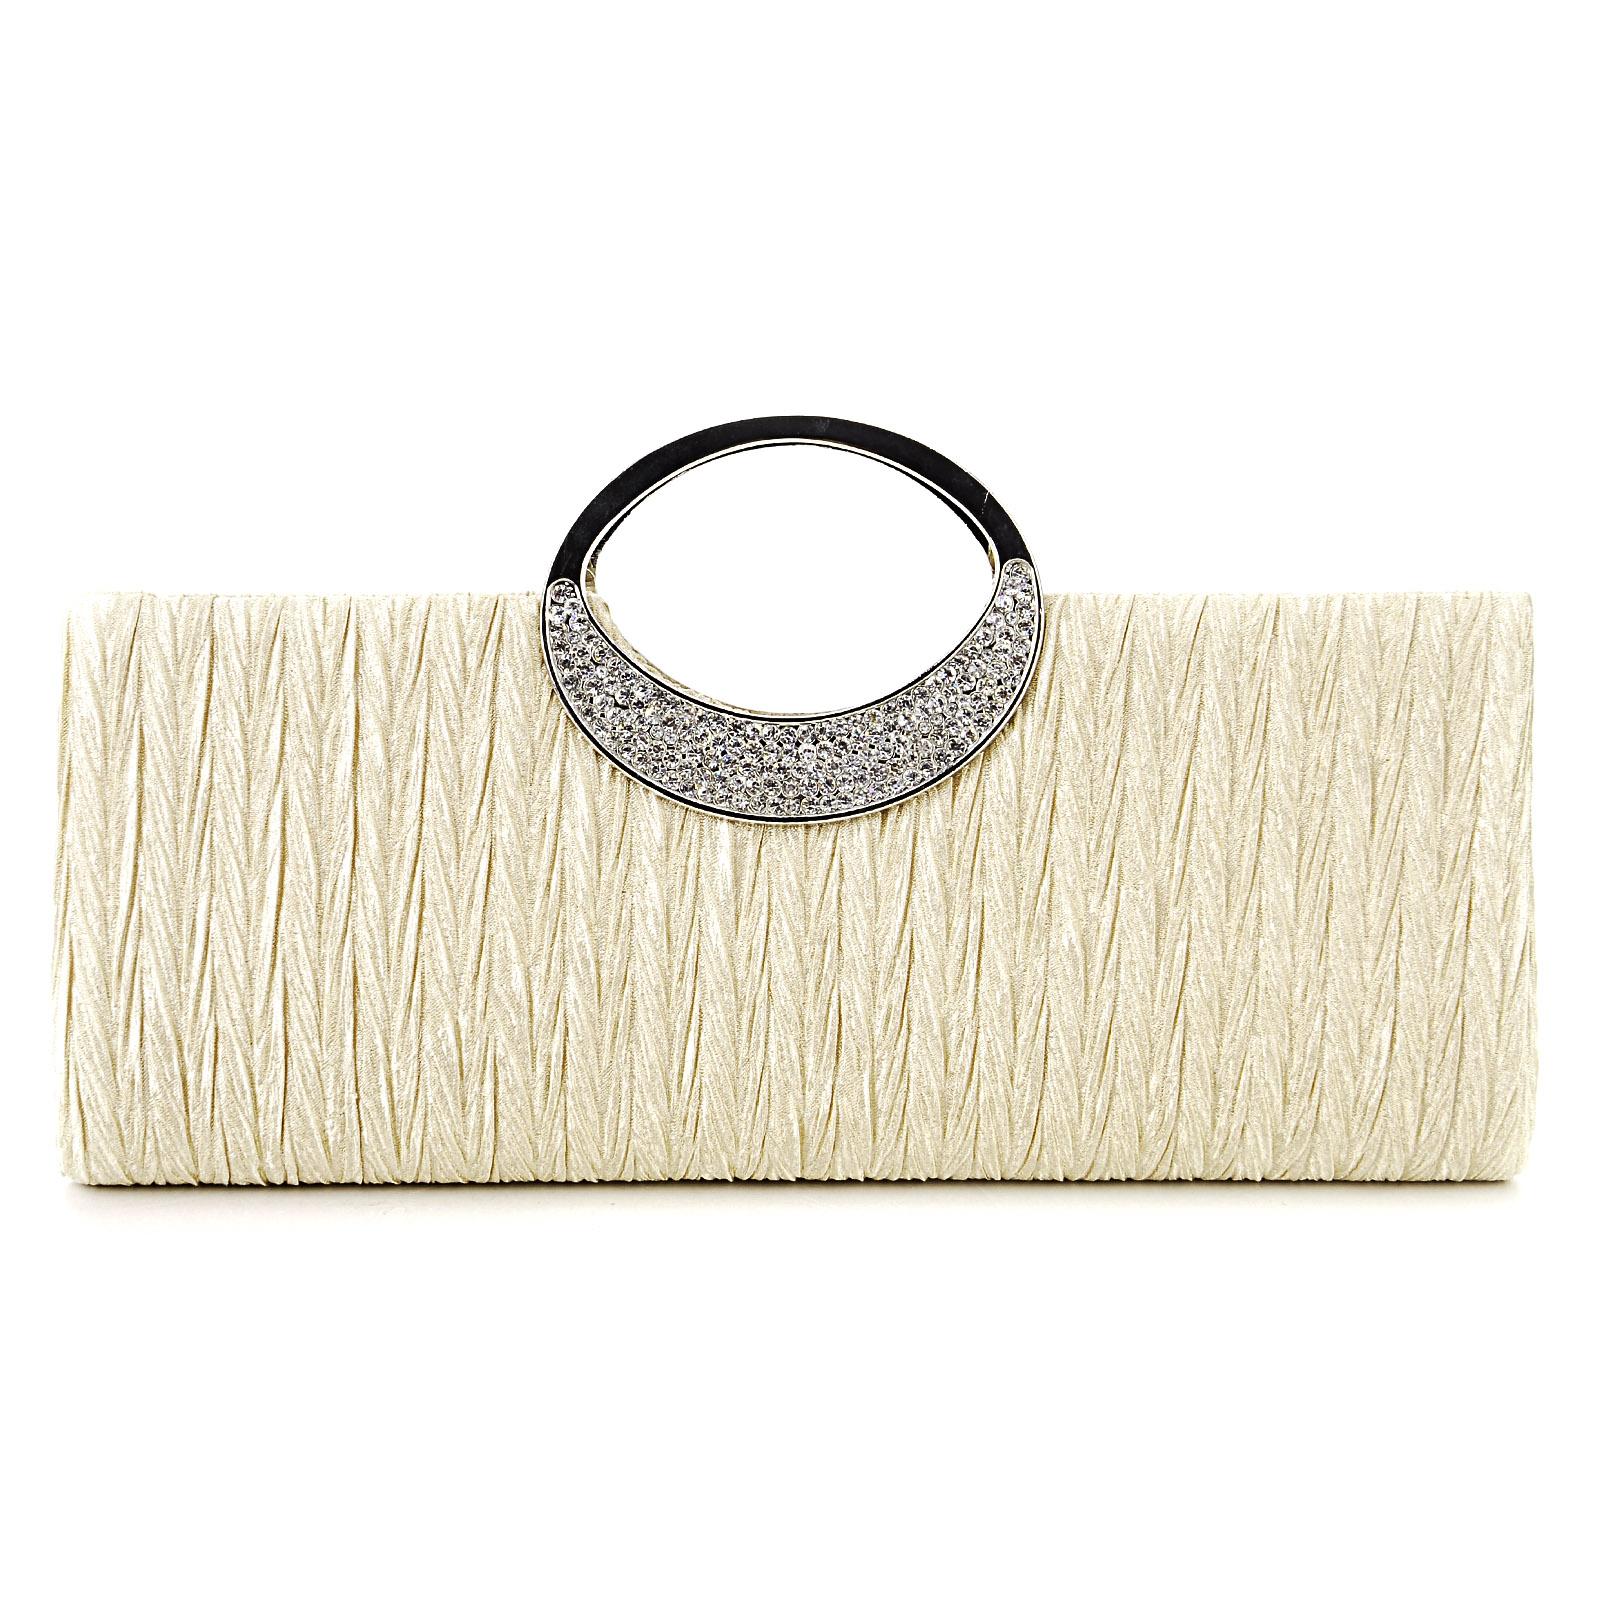 Clutch purse with ring handle : Big ring ladies purse bridal handbag evening clutch